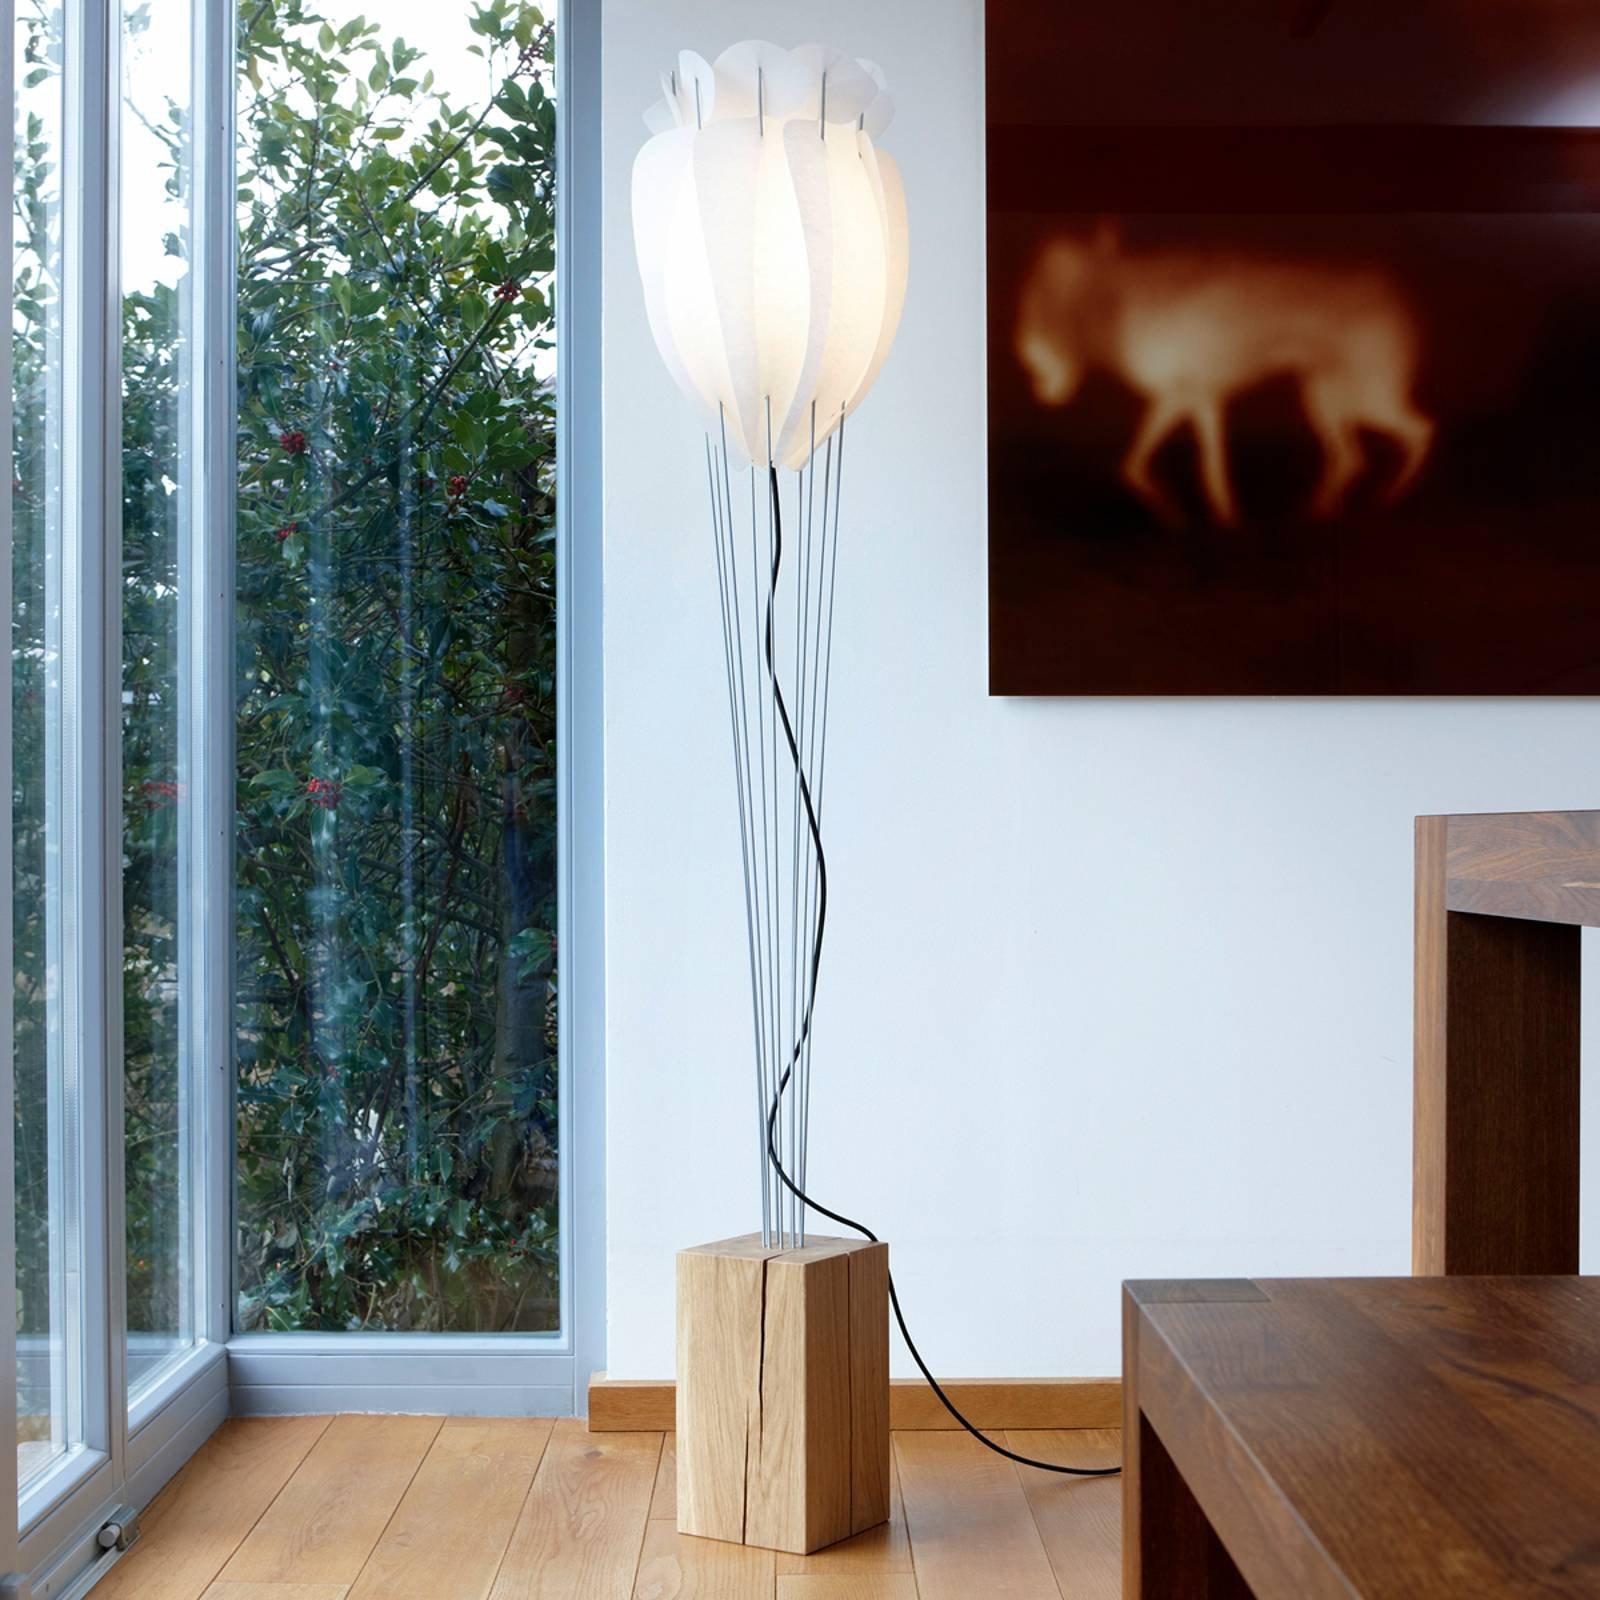 Dekorativ Tulip gulvlampe i naturlig eik